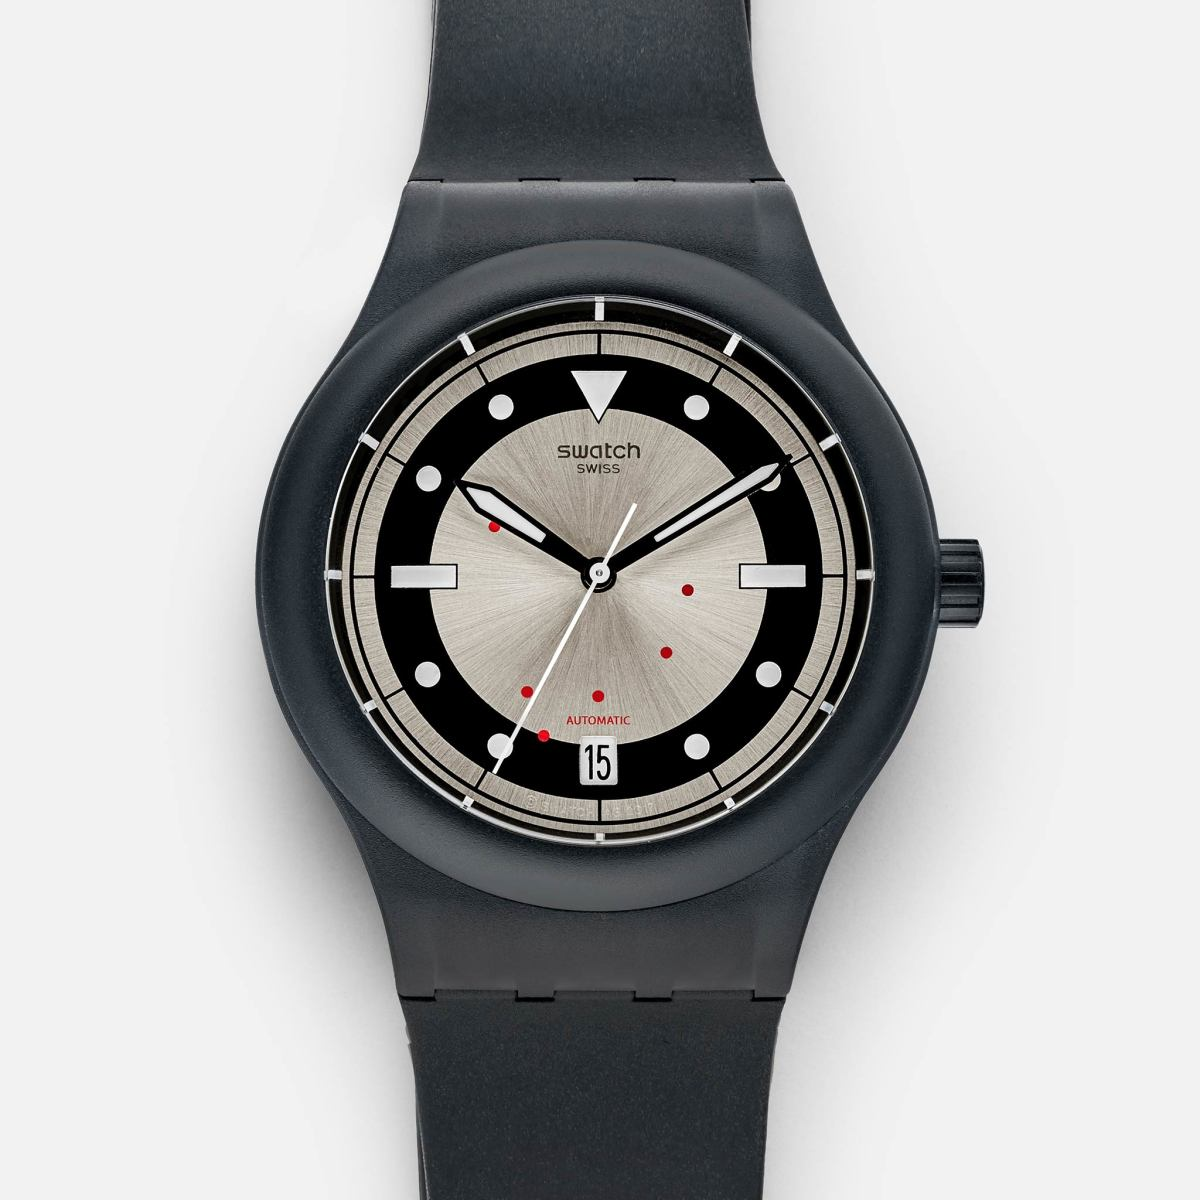 Hodinkee x Swatch Sistem51